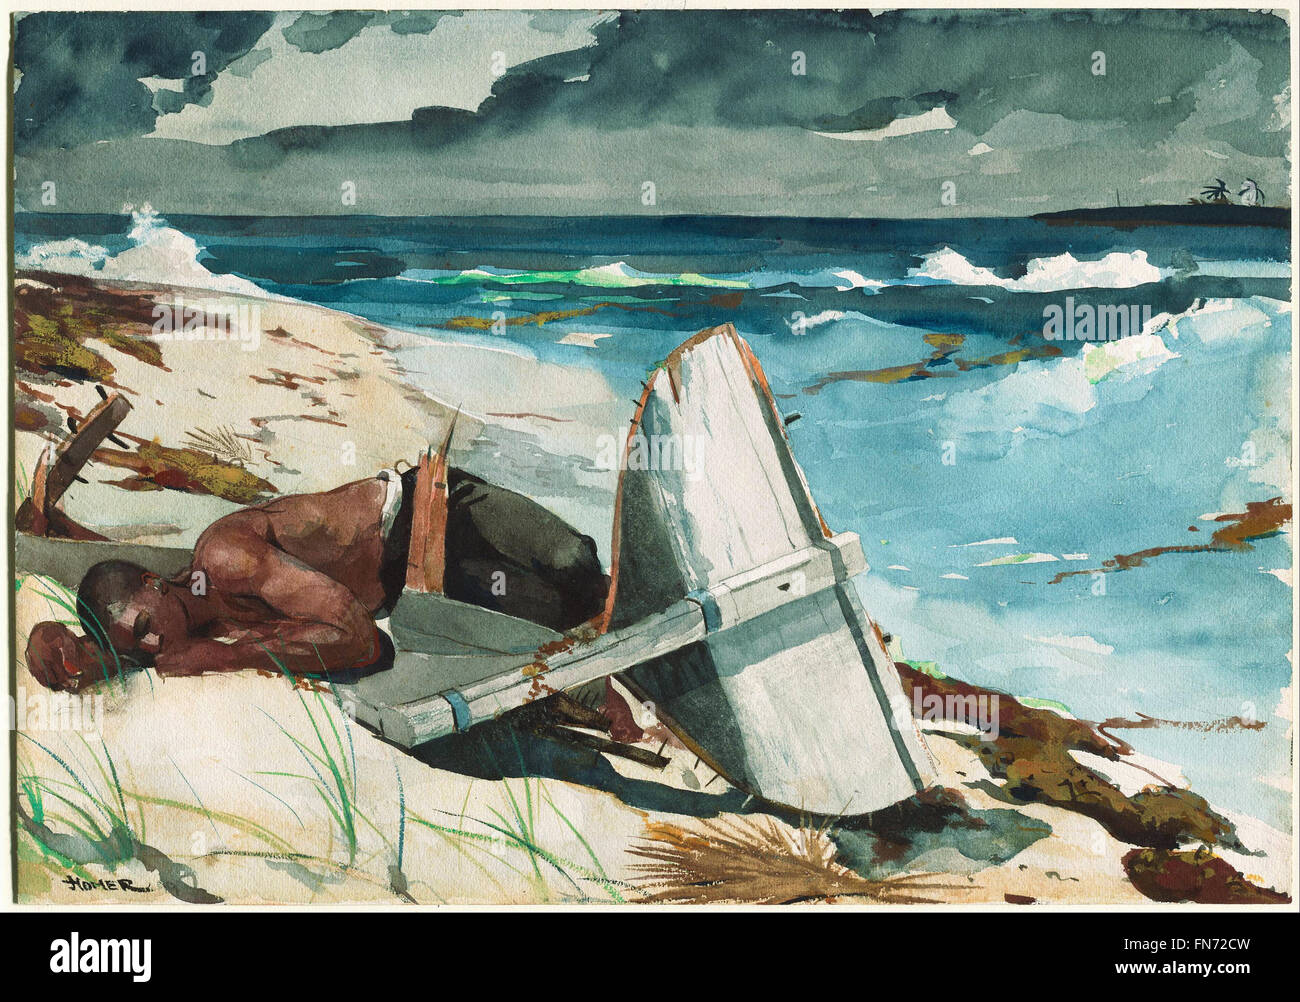 Winslow Homer - nach dem Hurrikan, Bahamas Stockbild